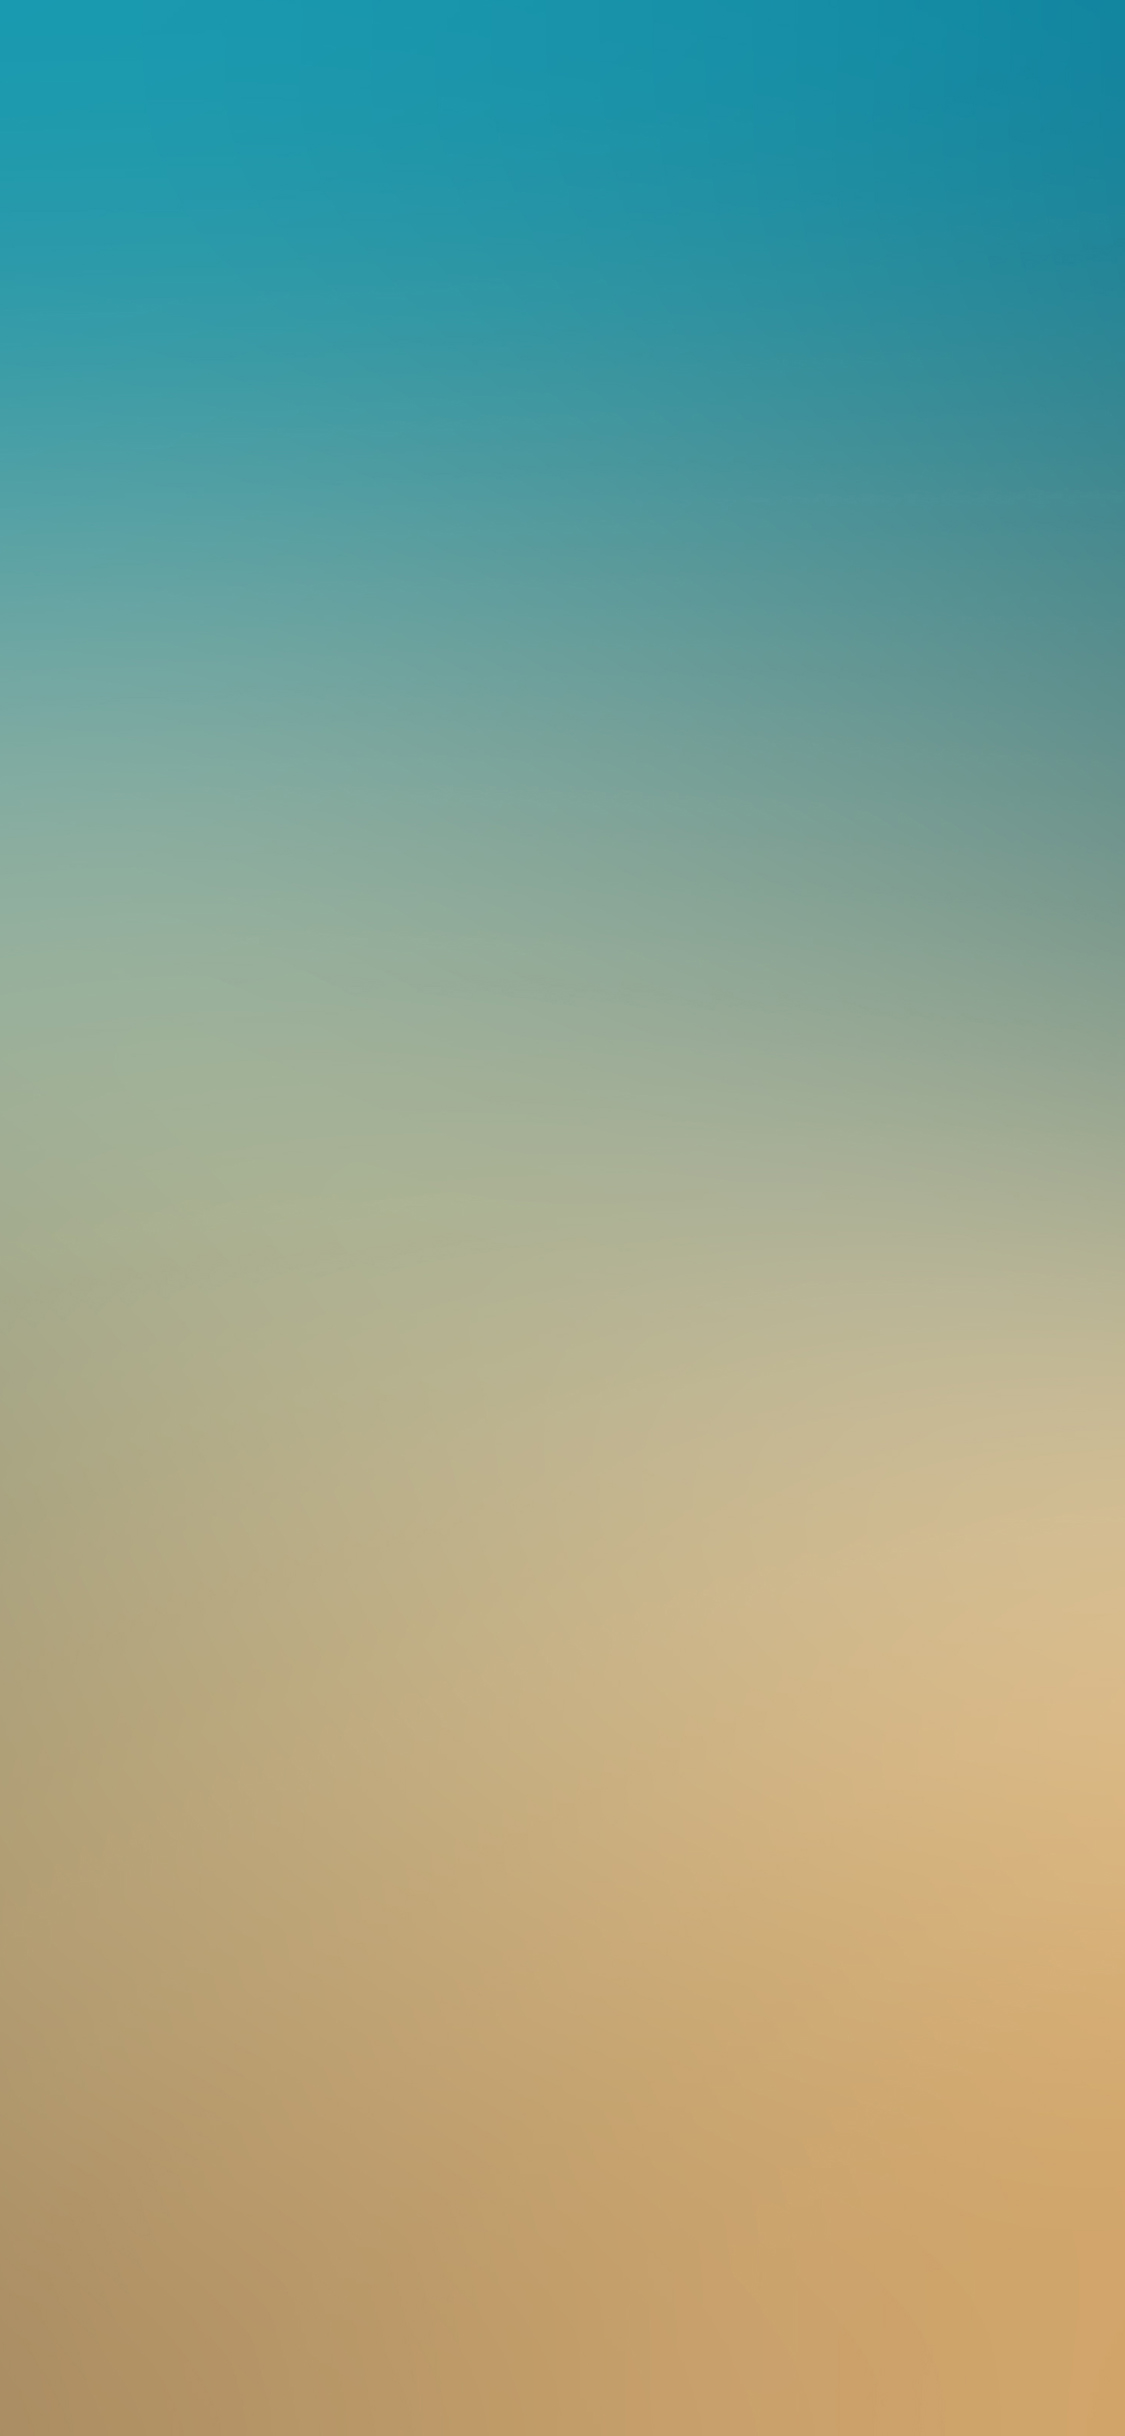 iPhoneXpapers.com-Apple-iPhone-wallpaper-sa55-wallpaper-caribbean-blur